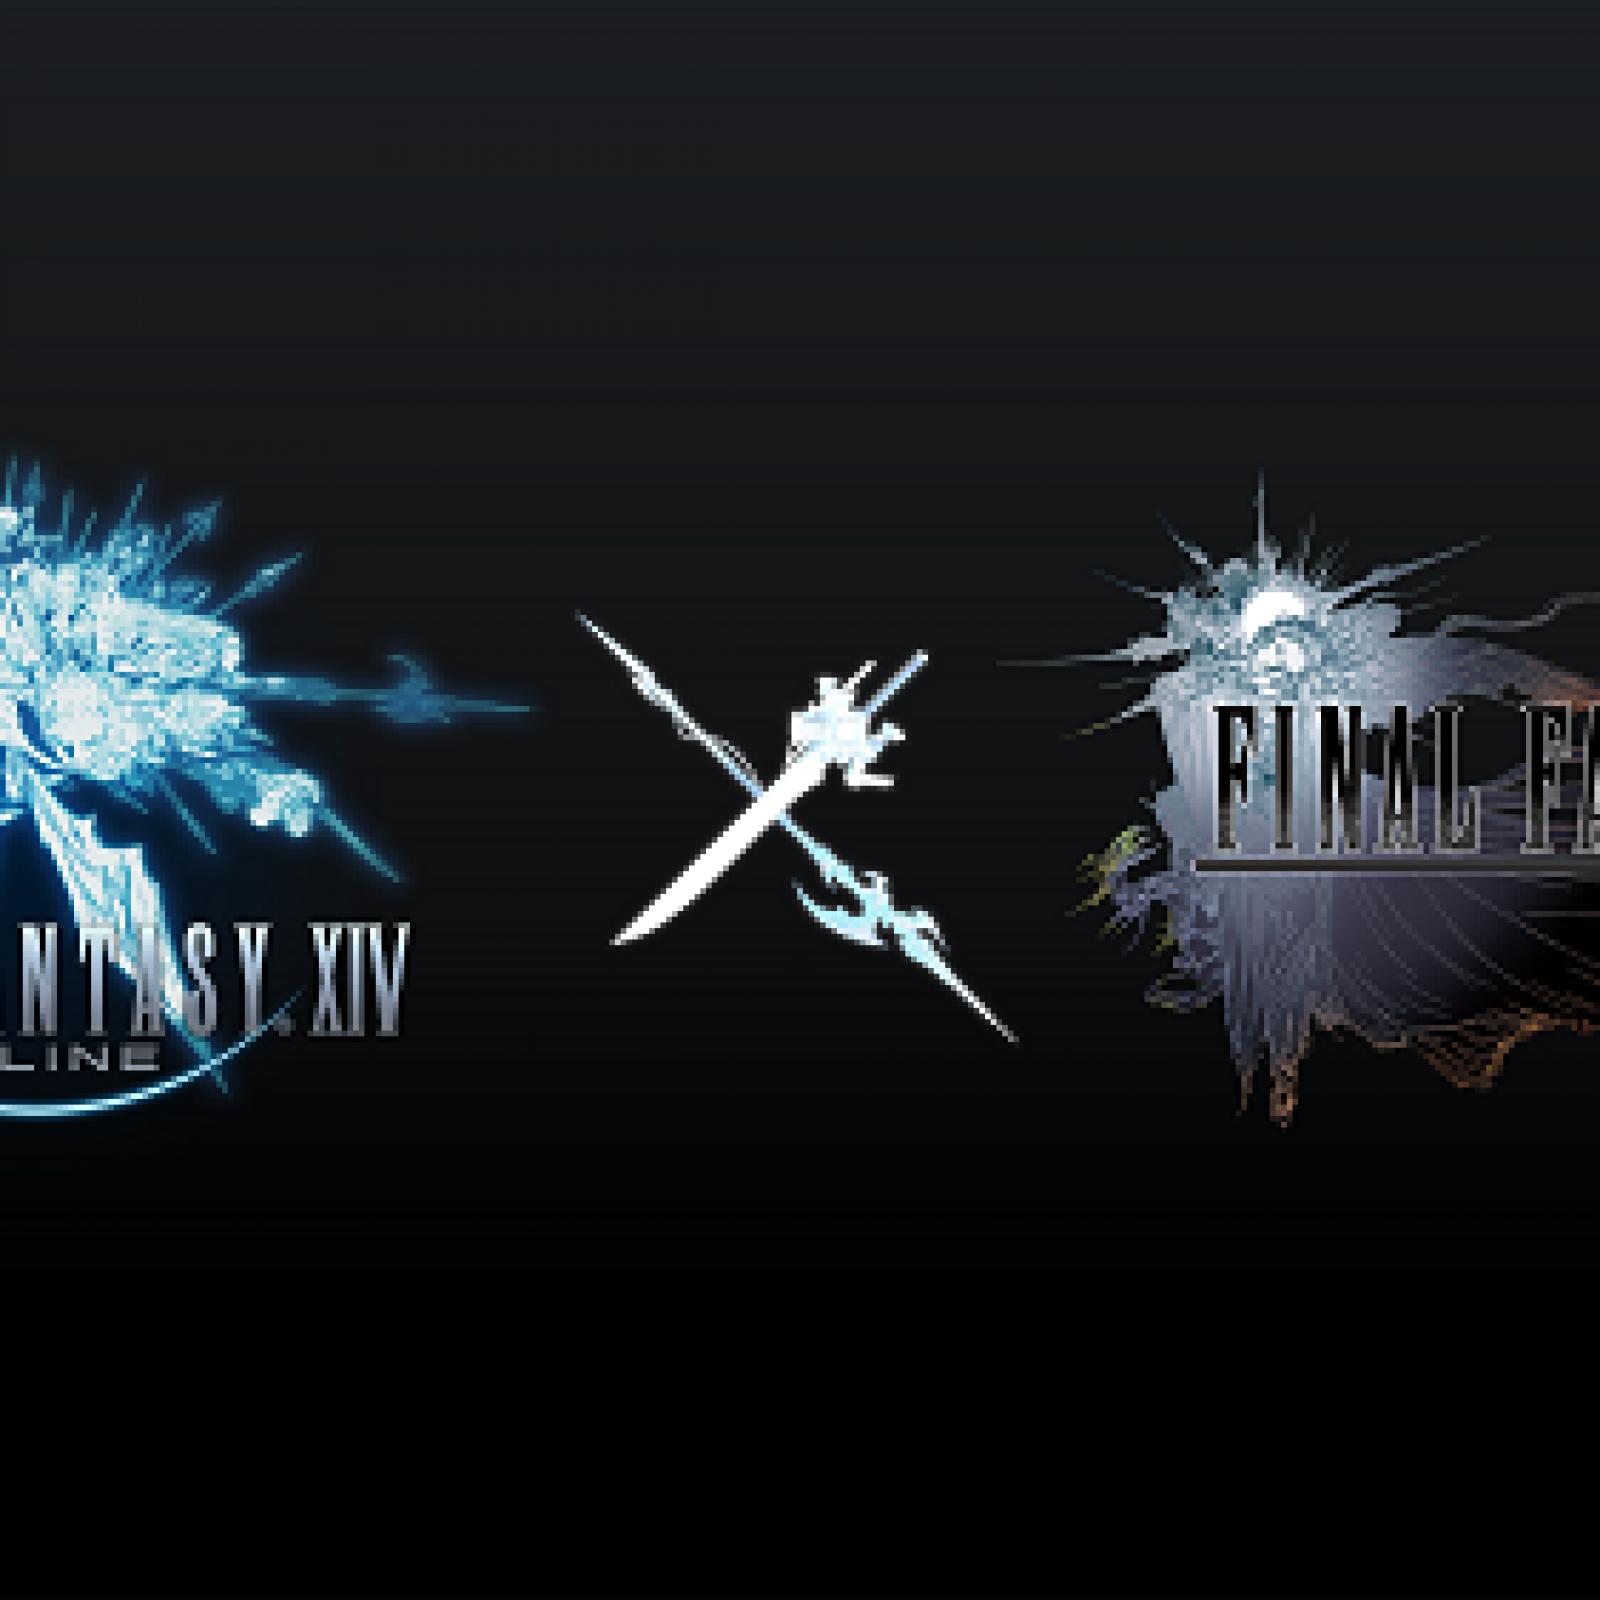 Final Fantasy XIV x Final Fantasy XV Collaboration Trailer